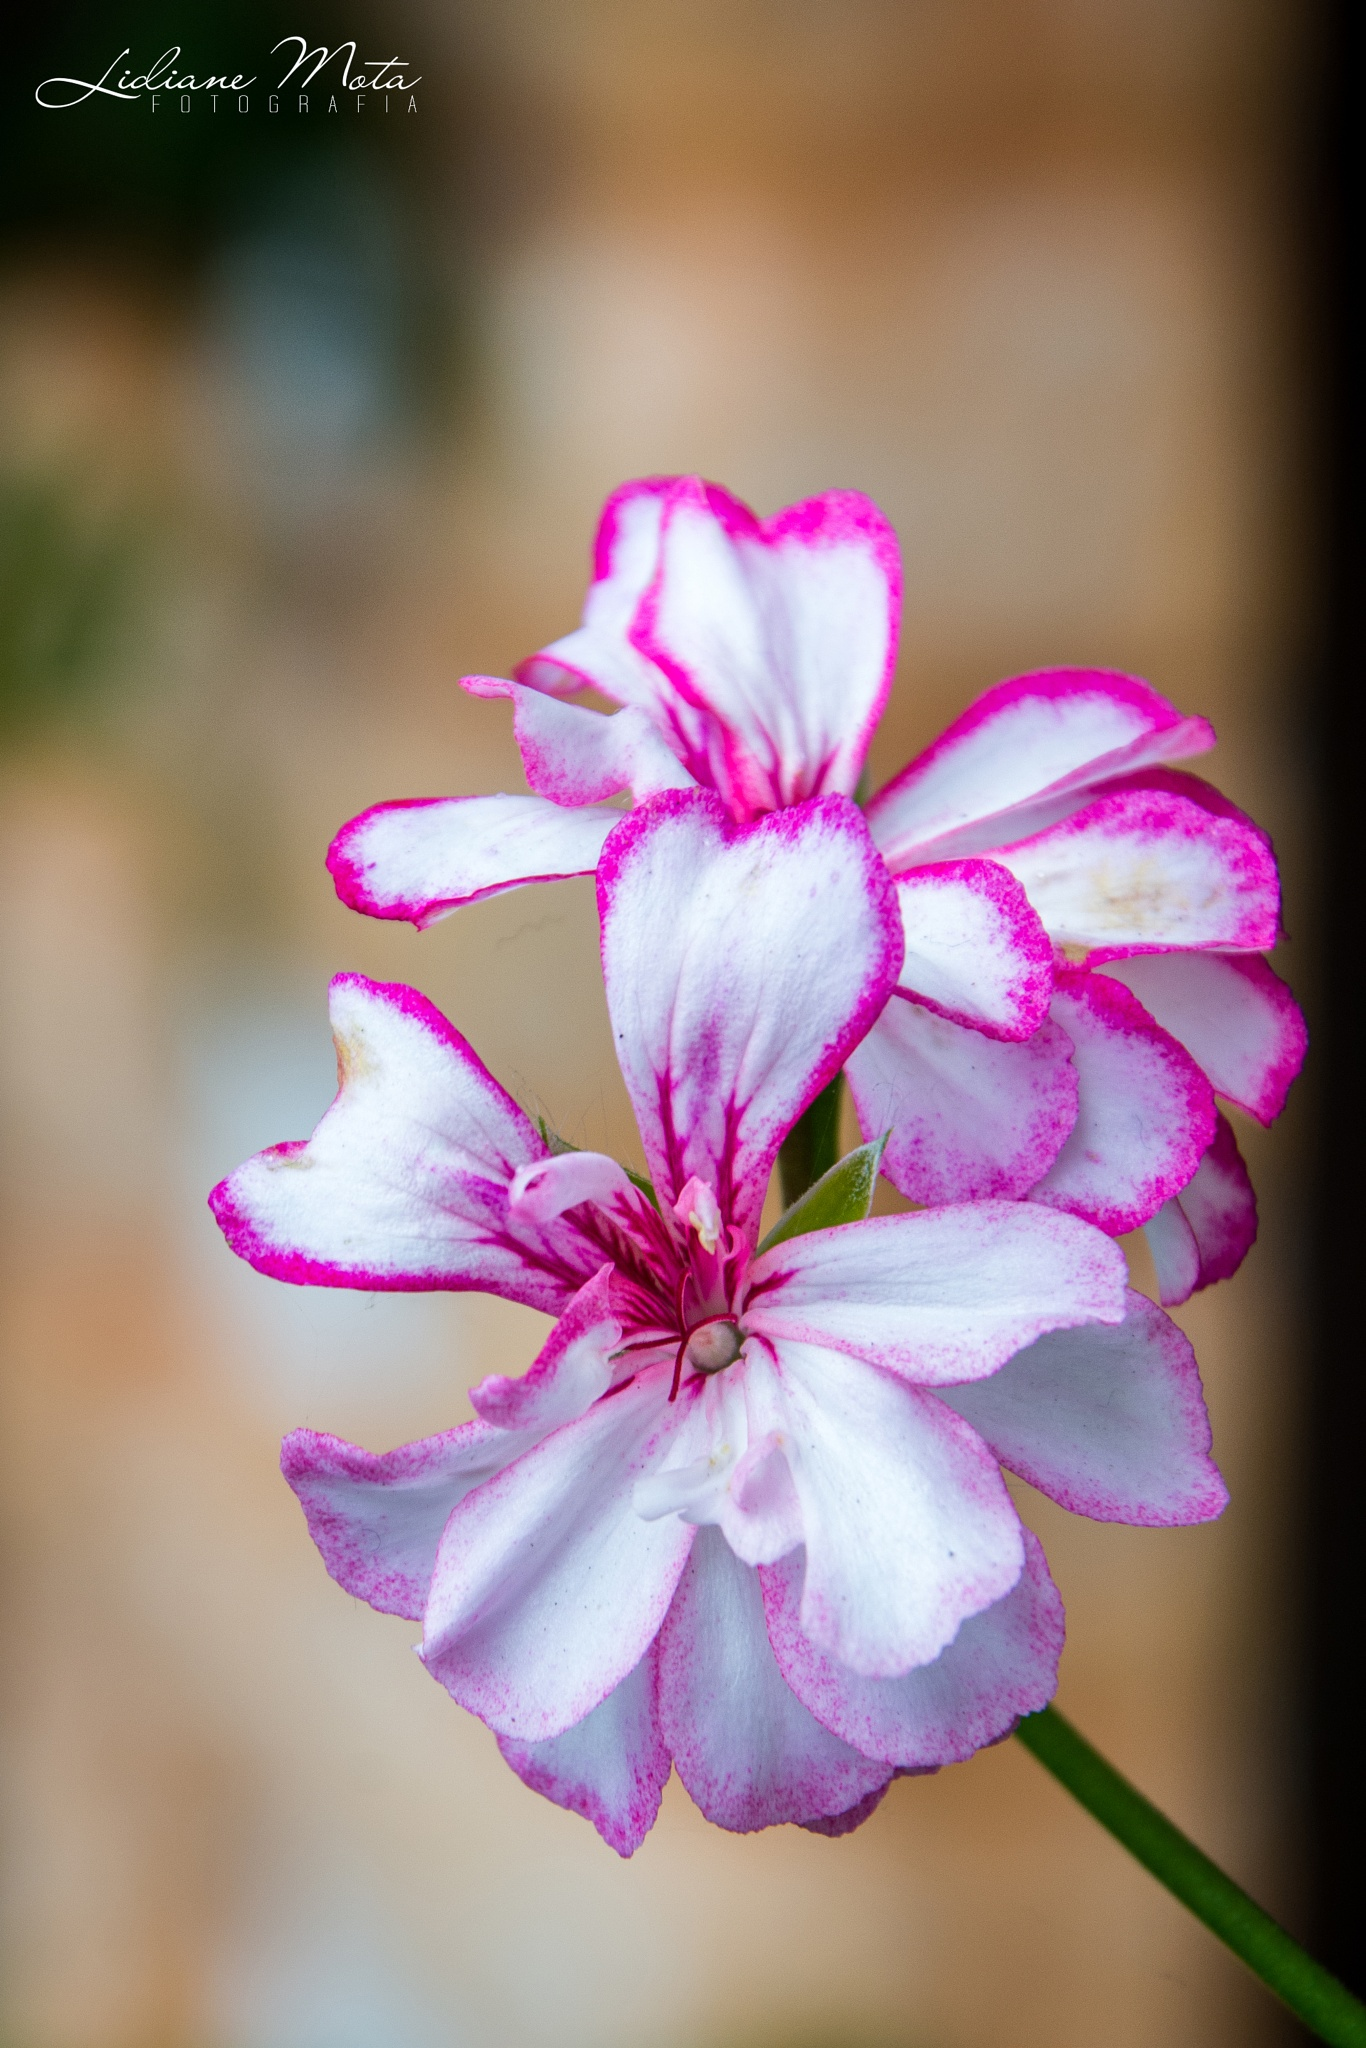 Flor delicada by LidianeMota